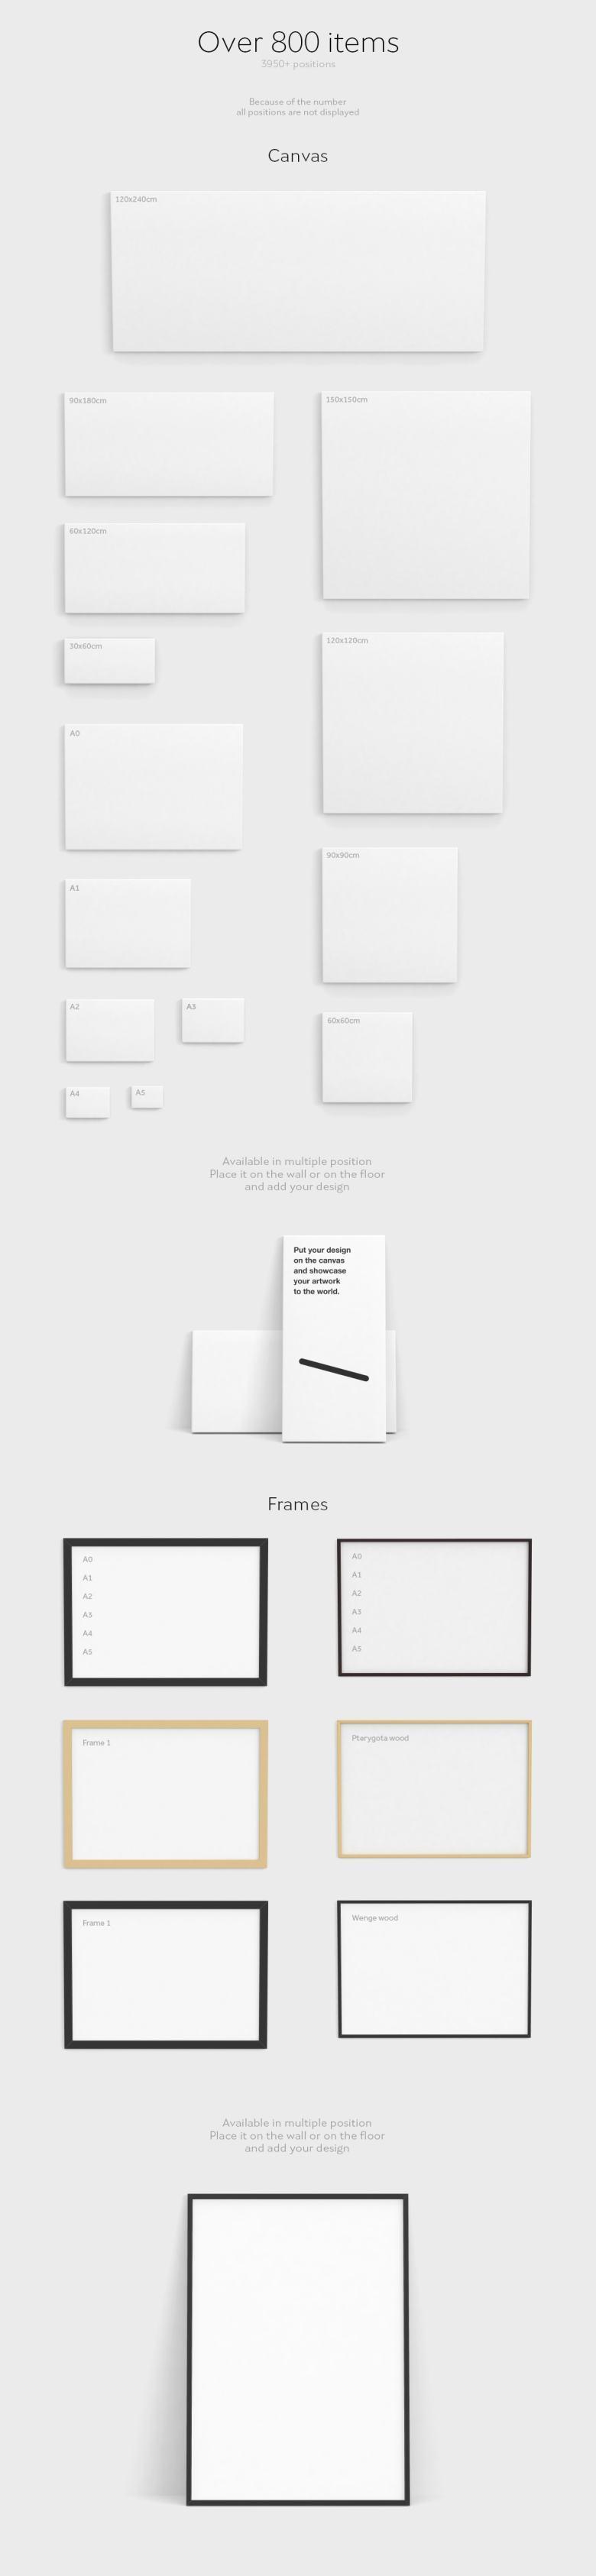 creative-market-scene-creator-bundle-20